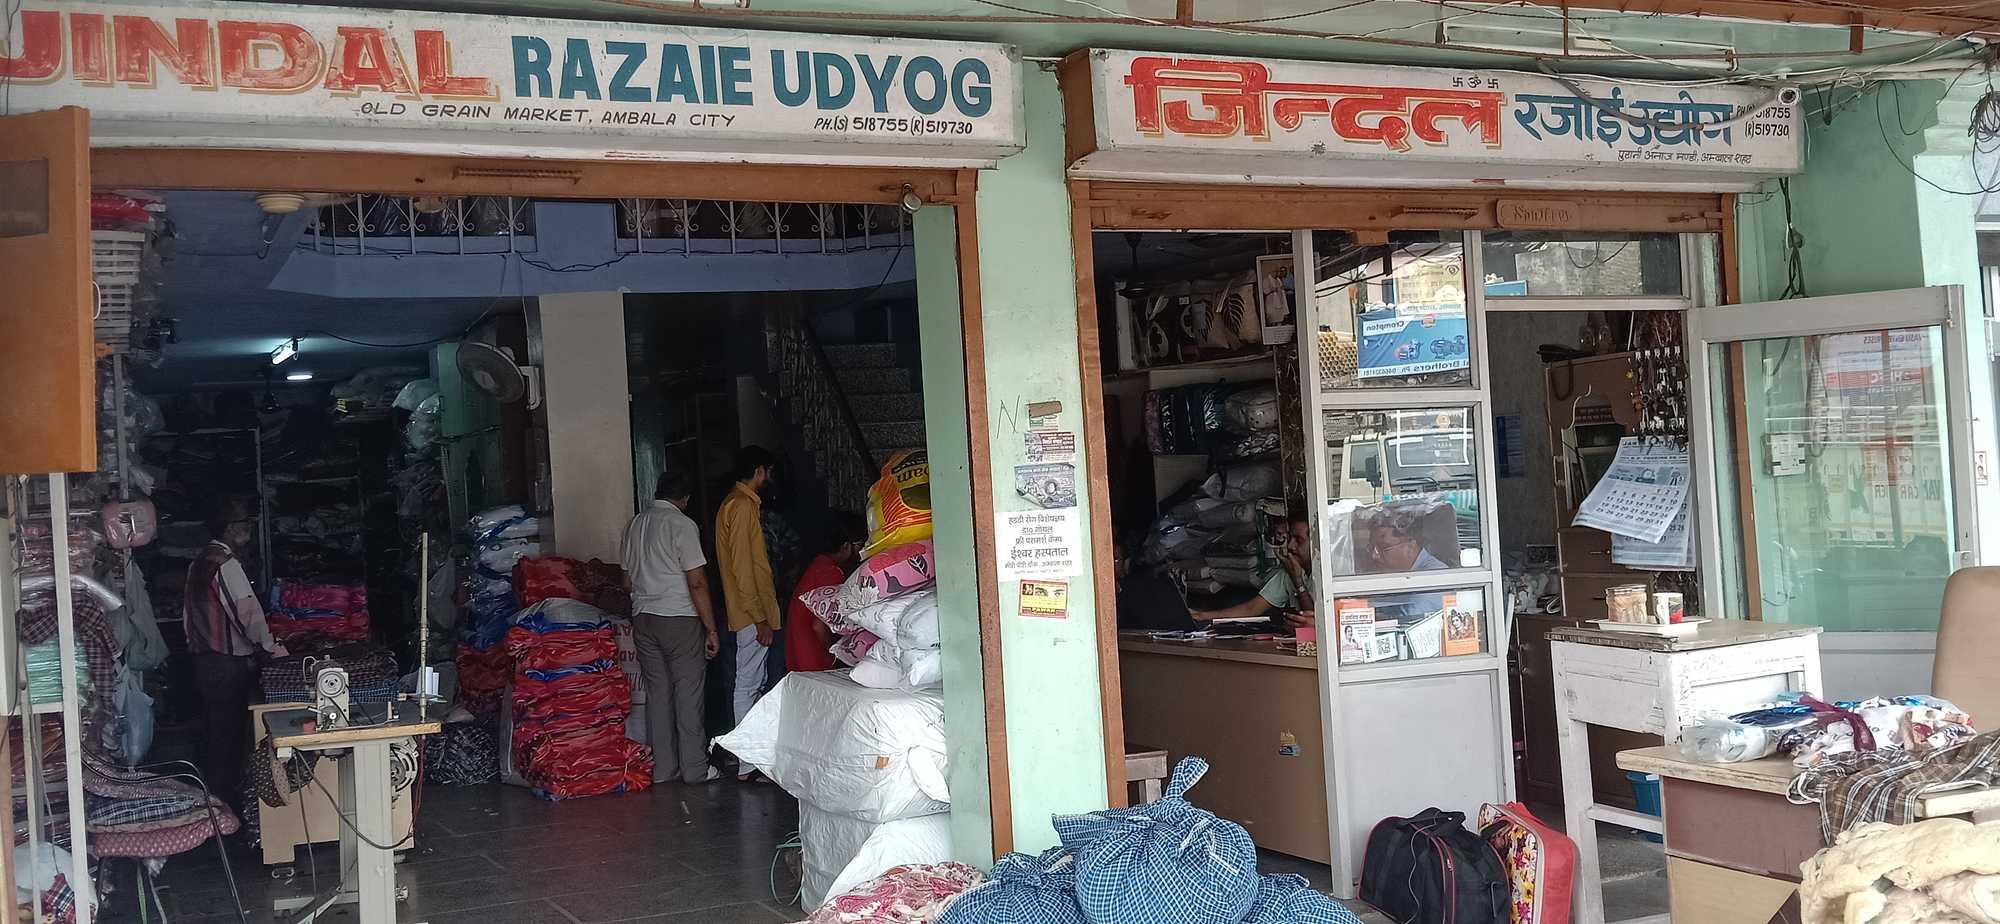 Top Refresh Mattress Manufacturers in Ambala City - Best